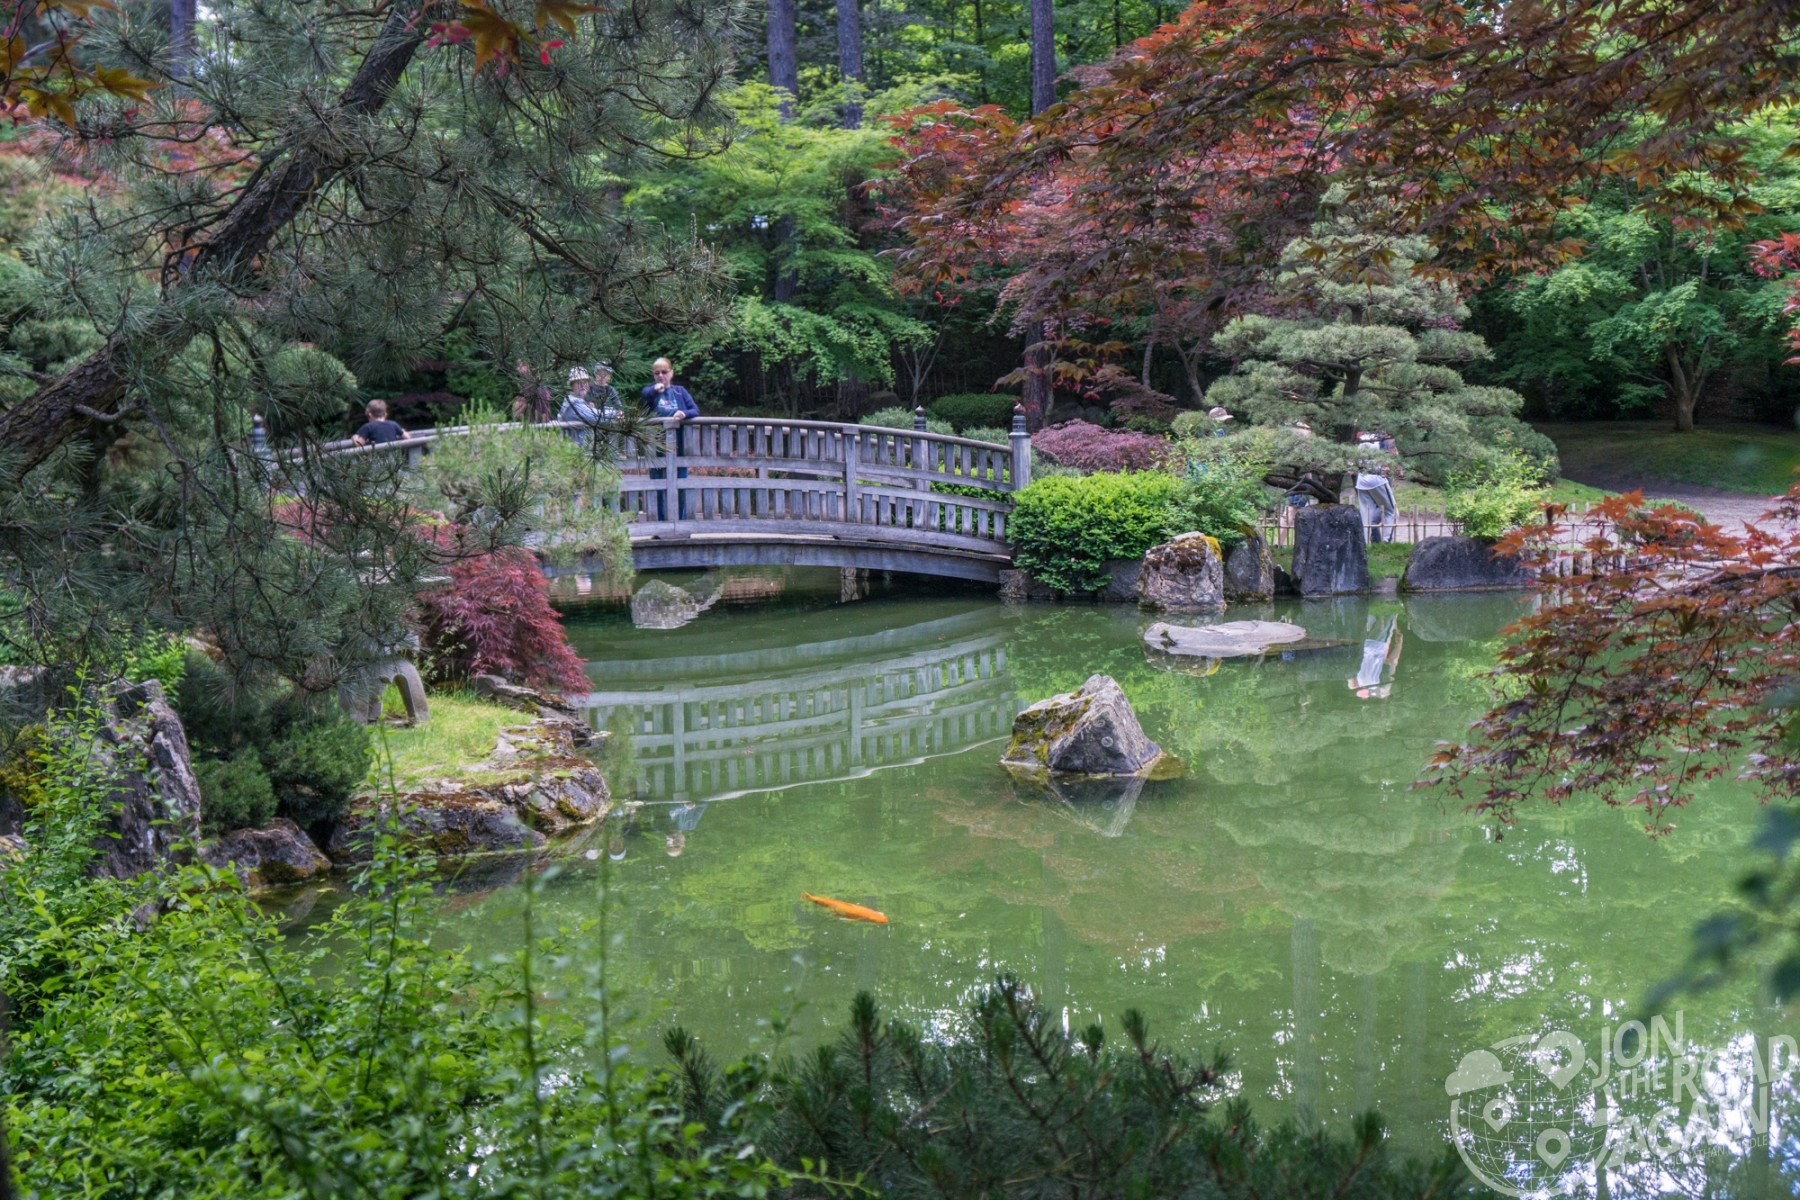 Nishinomiya Tsutakawa Japanese Garden, Spokane, WA